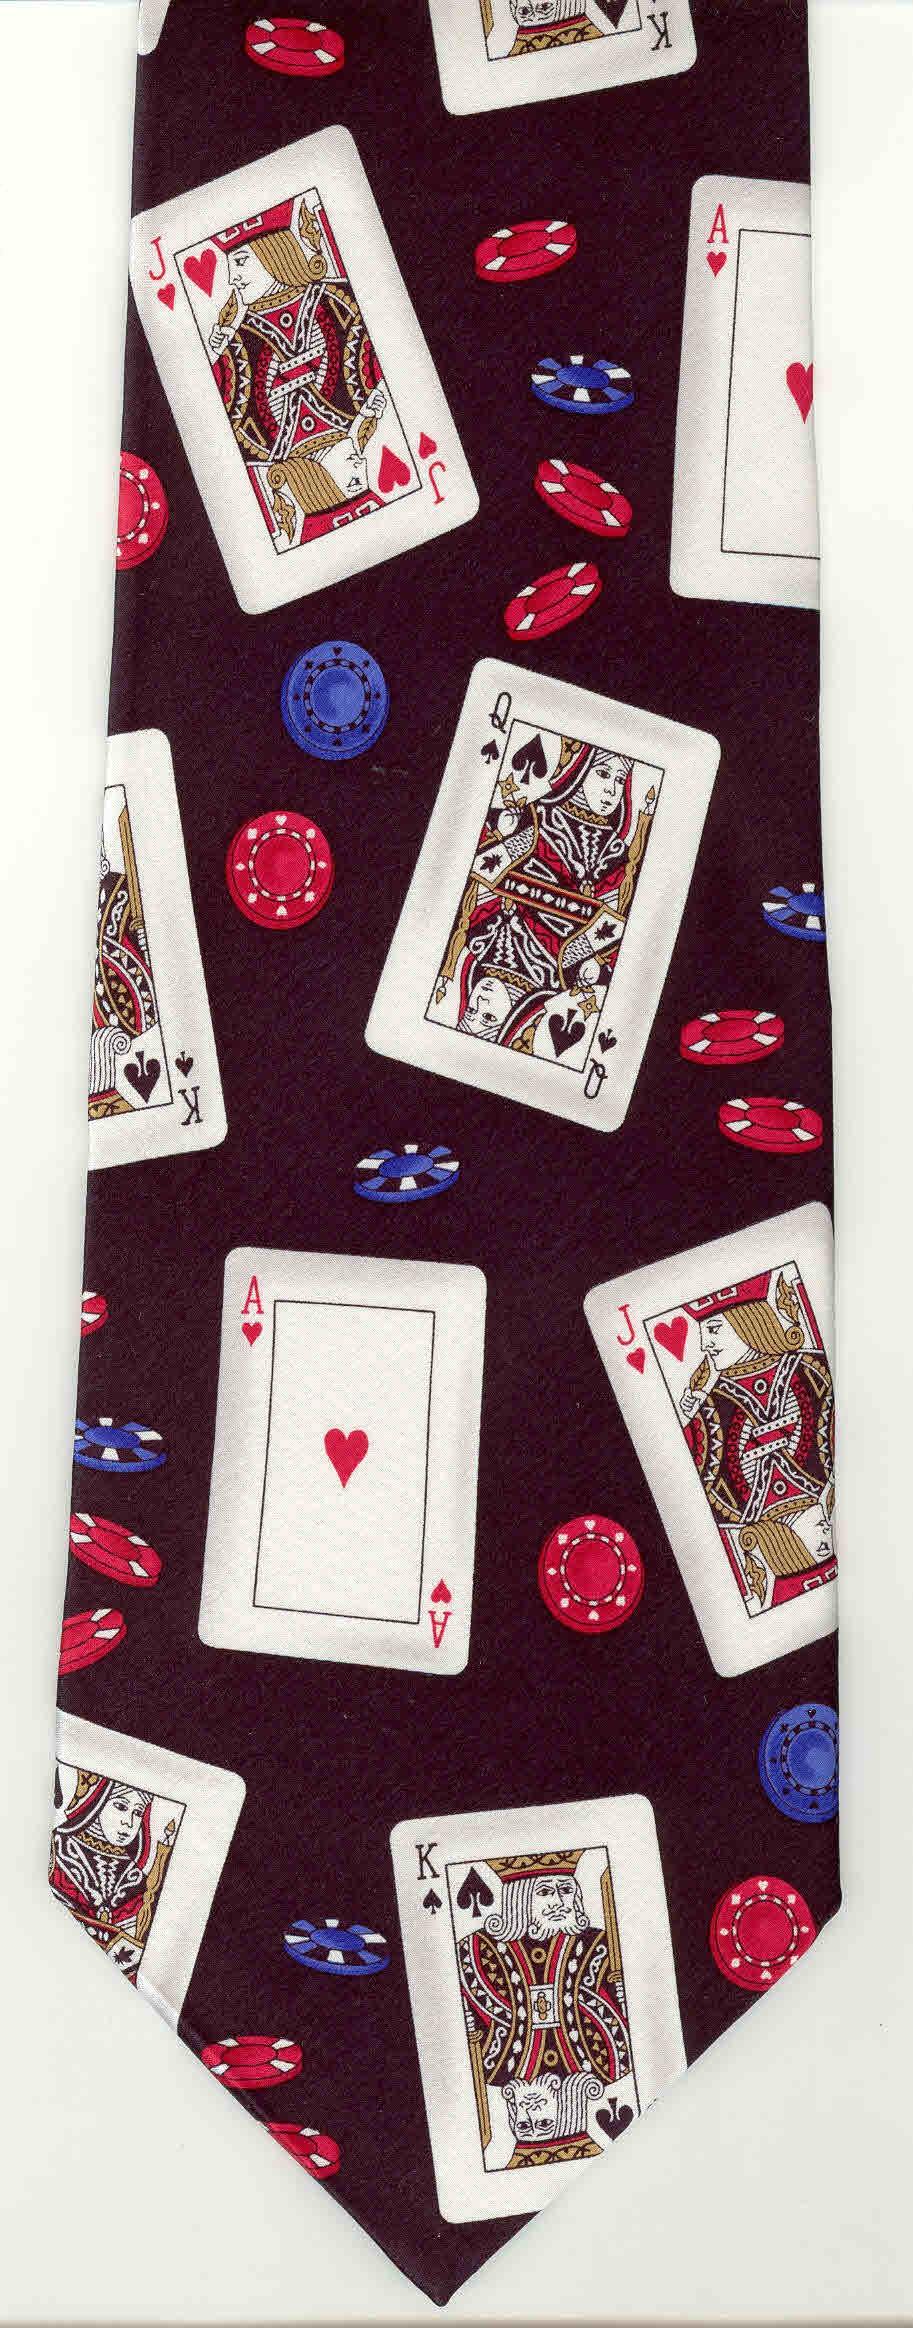 051 Chips & Cards.jpg